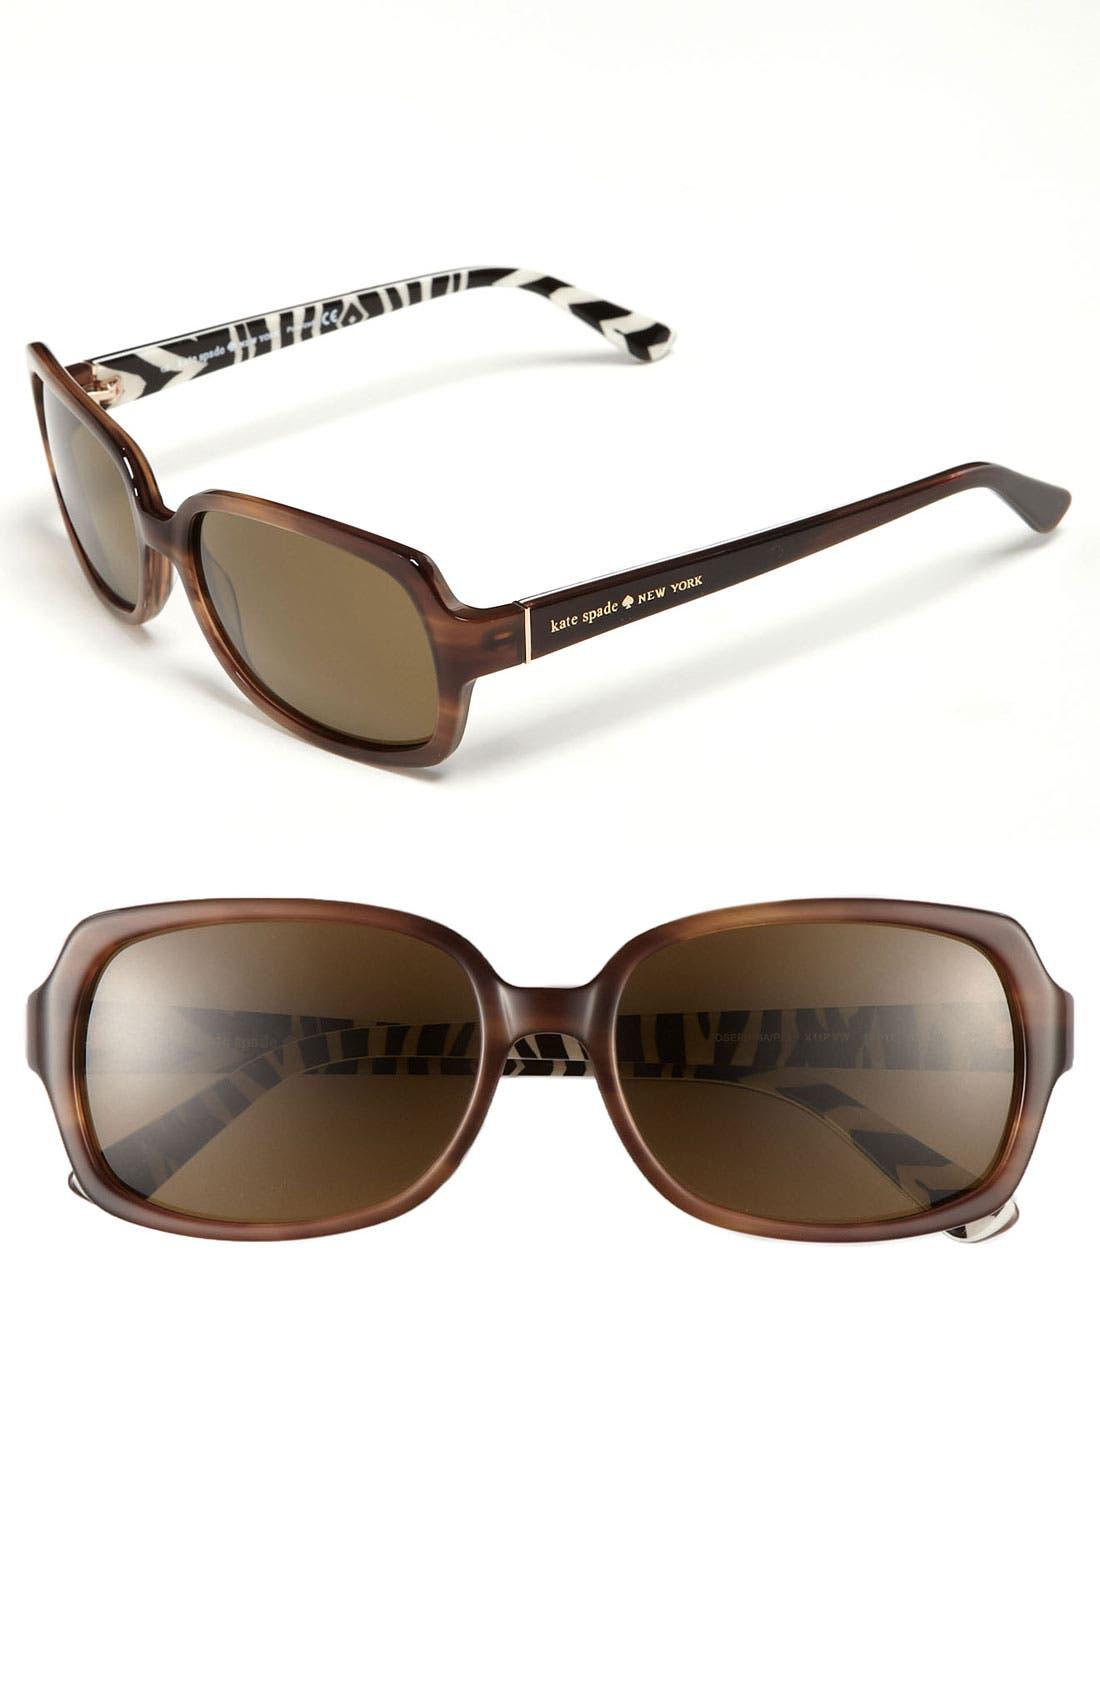 Main Image - kate spade new york 'josephina' 56mm polarized sunglasses